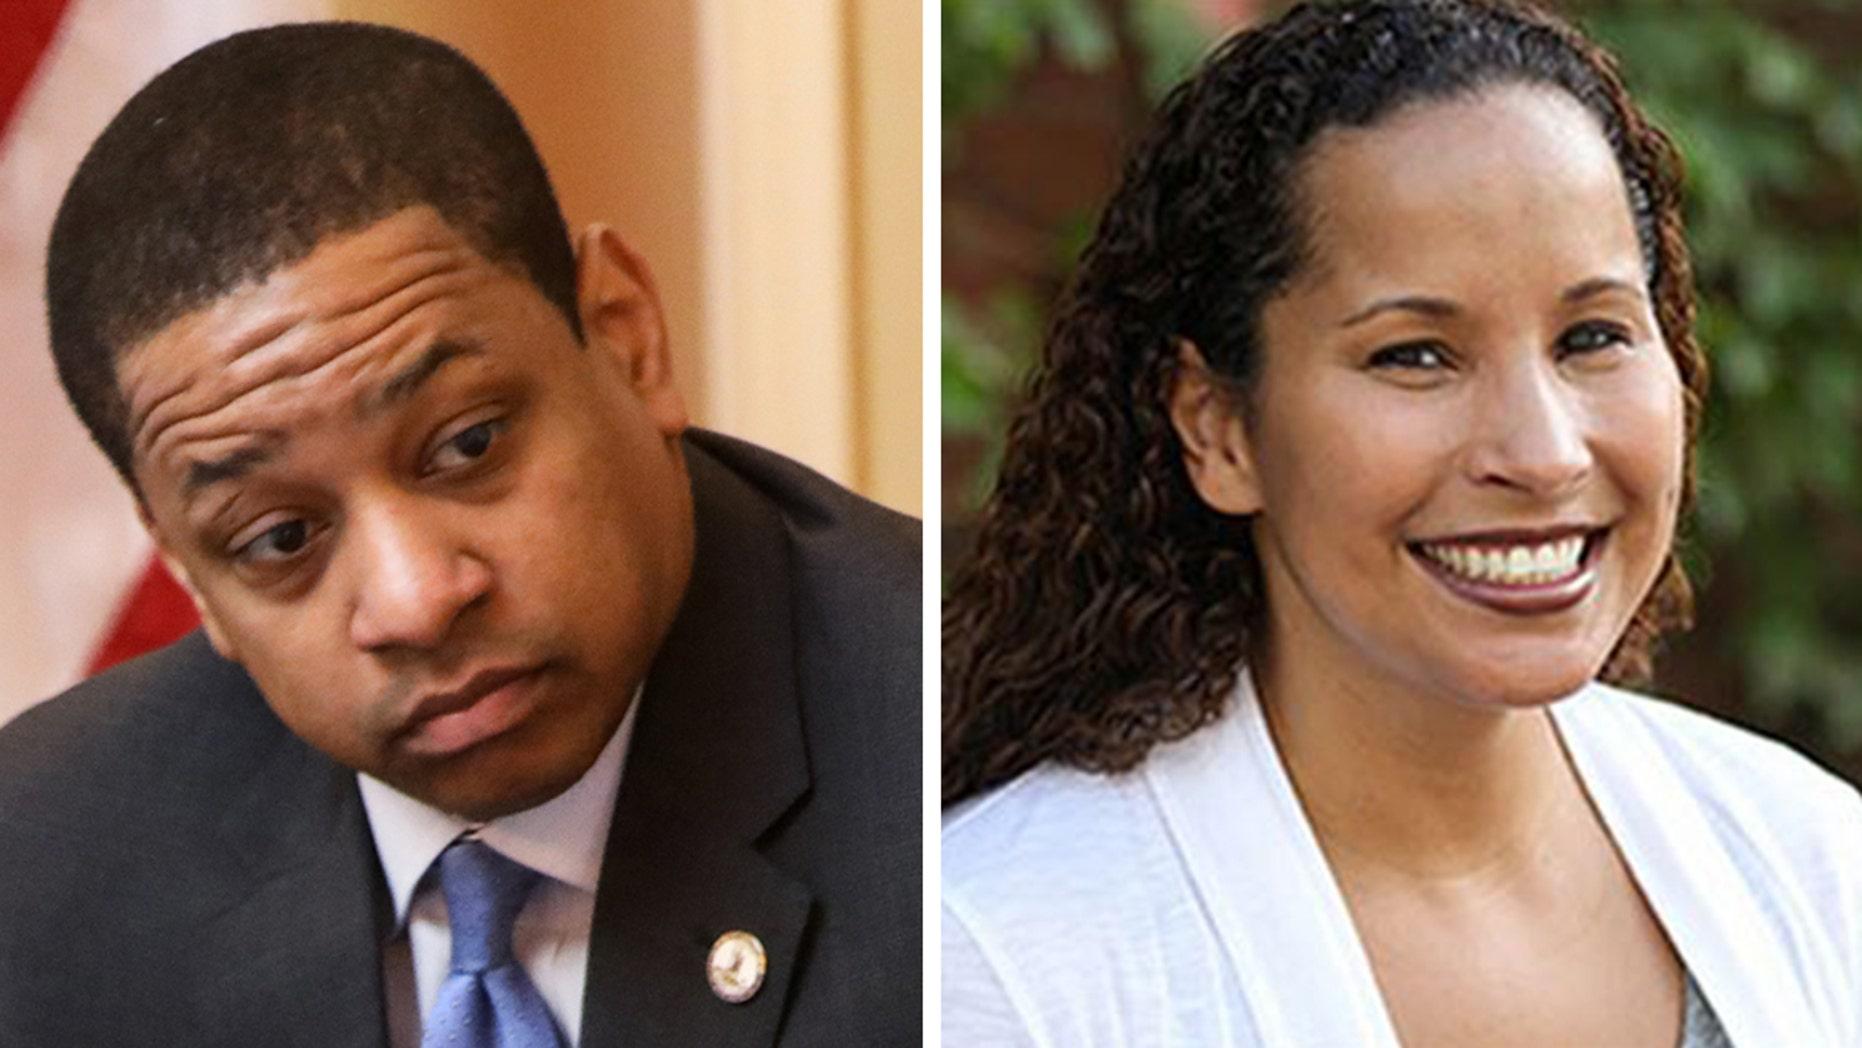 Virginia Lt. Gov. Justin Fairfax and Vanessa Tyson